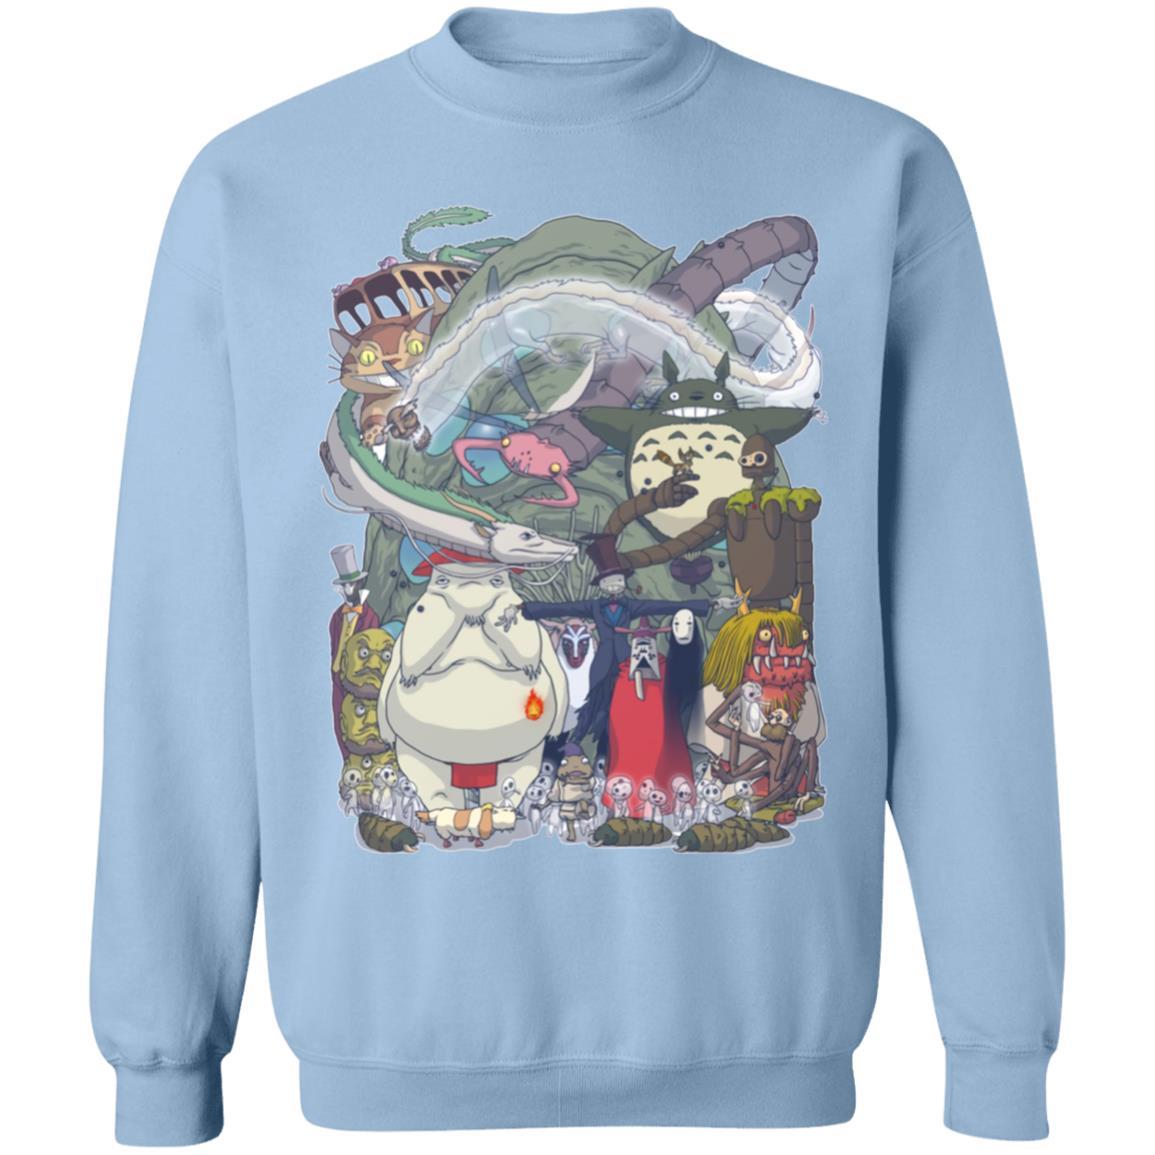 Ghibli Highlights Movies Characters Collection Sweatshirt